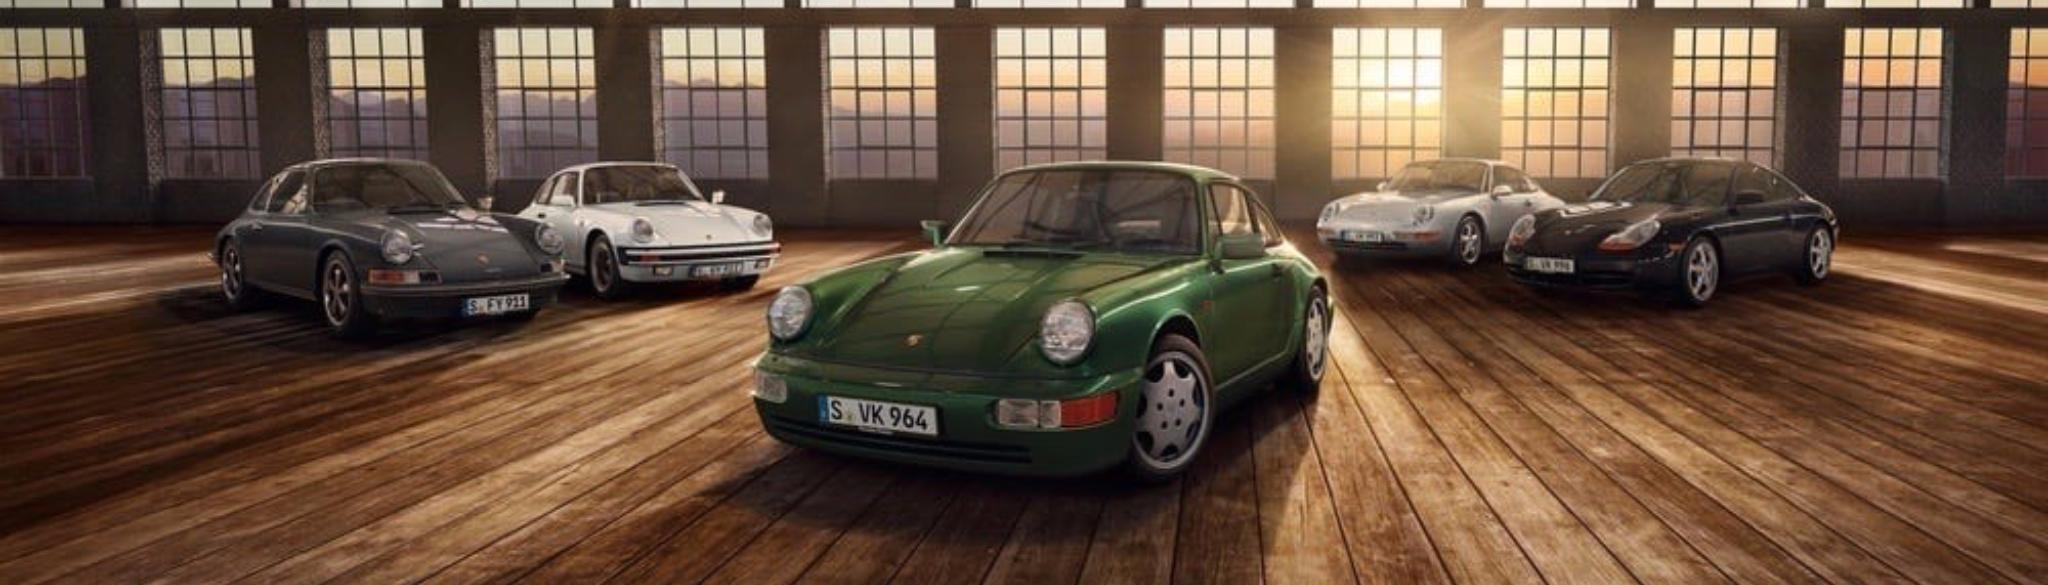 Origins Of The Air Cooled Porsche Engine